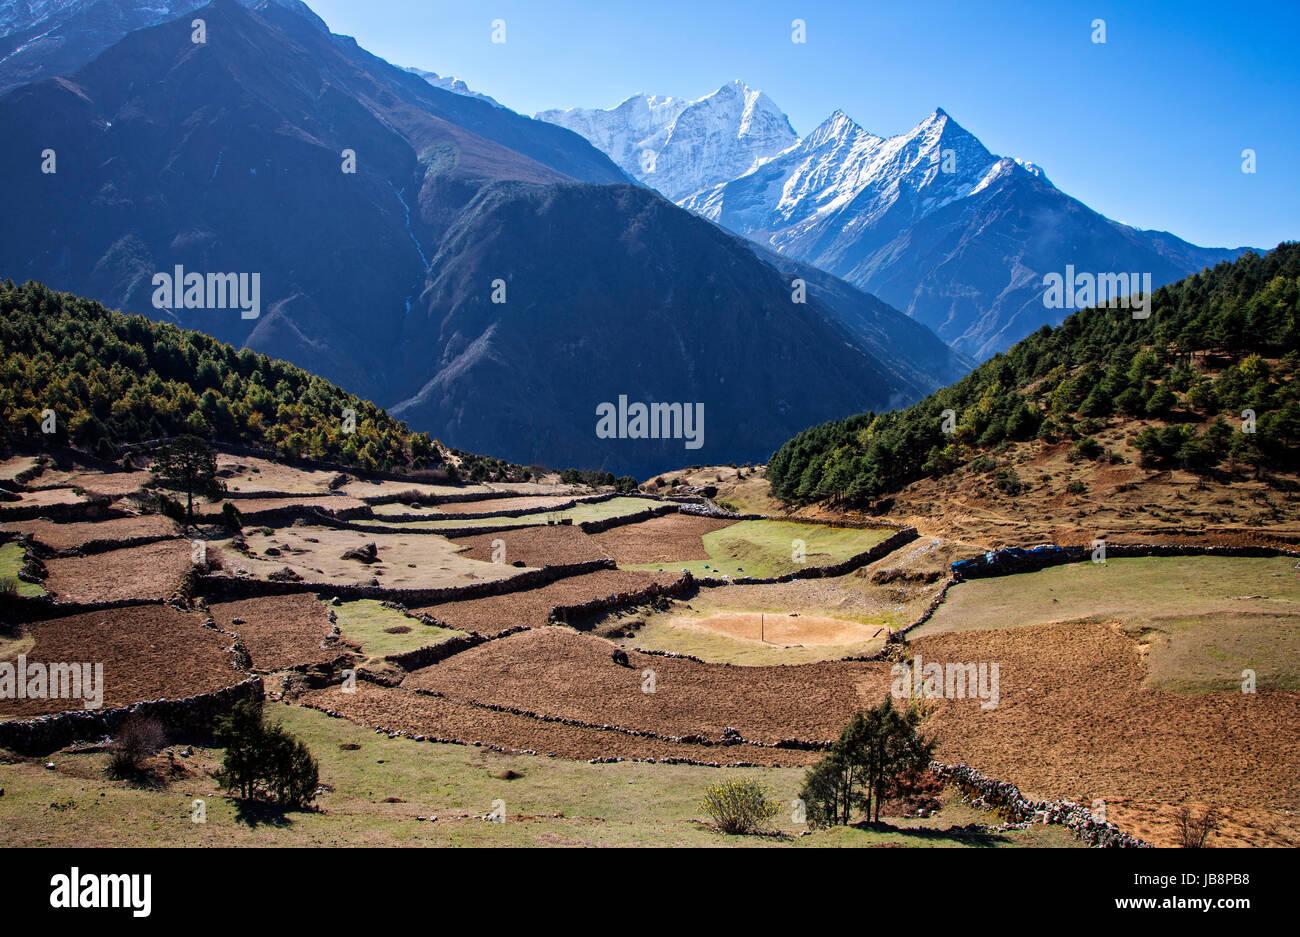 Terraced farm fields near Namche Bazaar under the shadow of Thamserku (6608 meters) in Sagarmatha National Park, - Stock Image